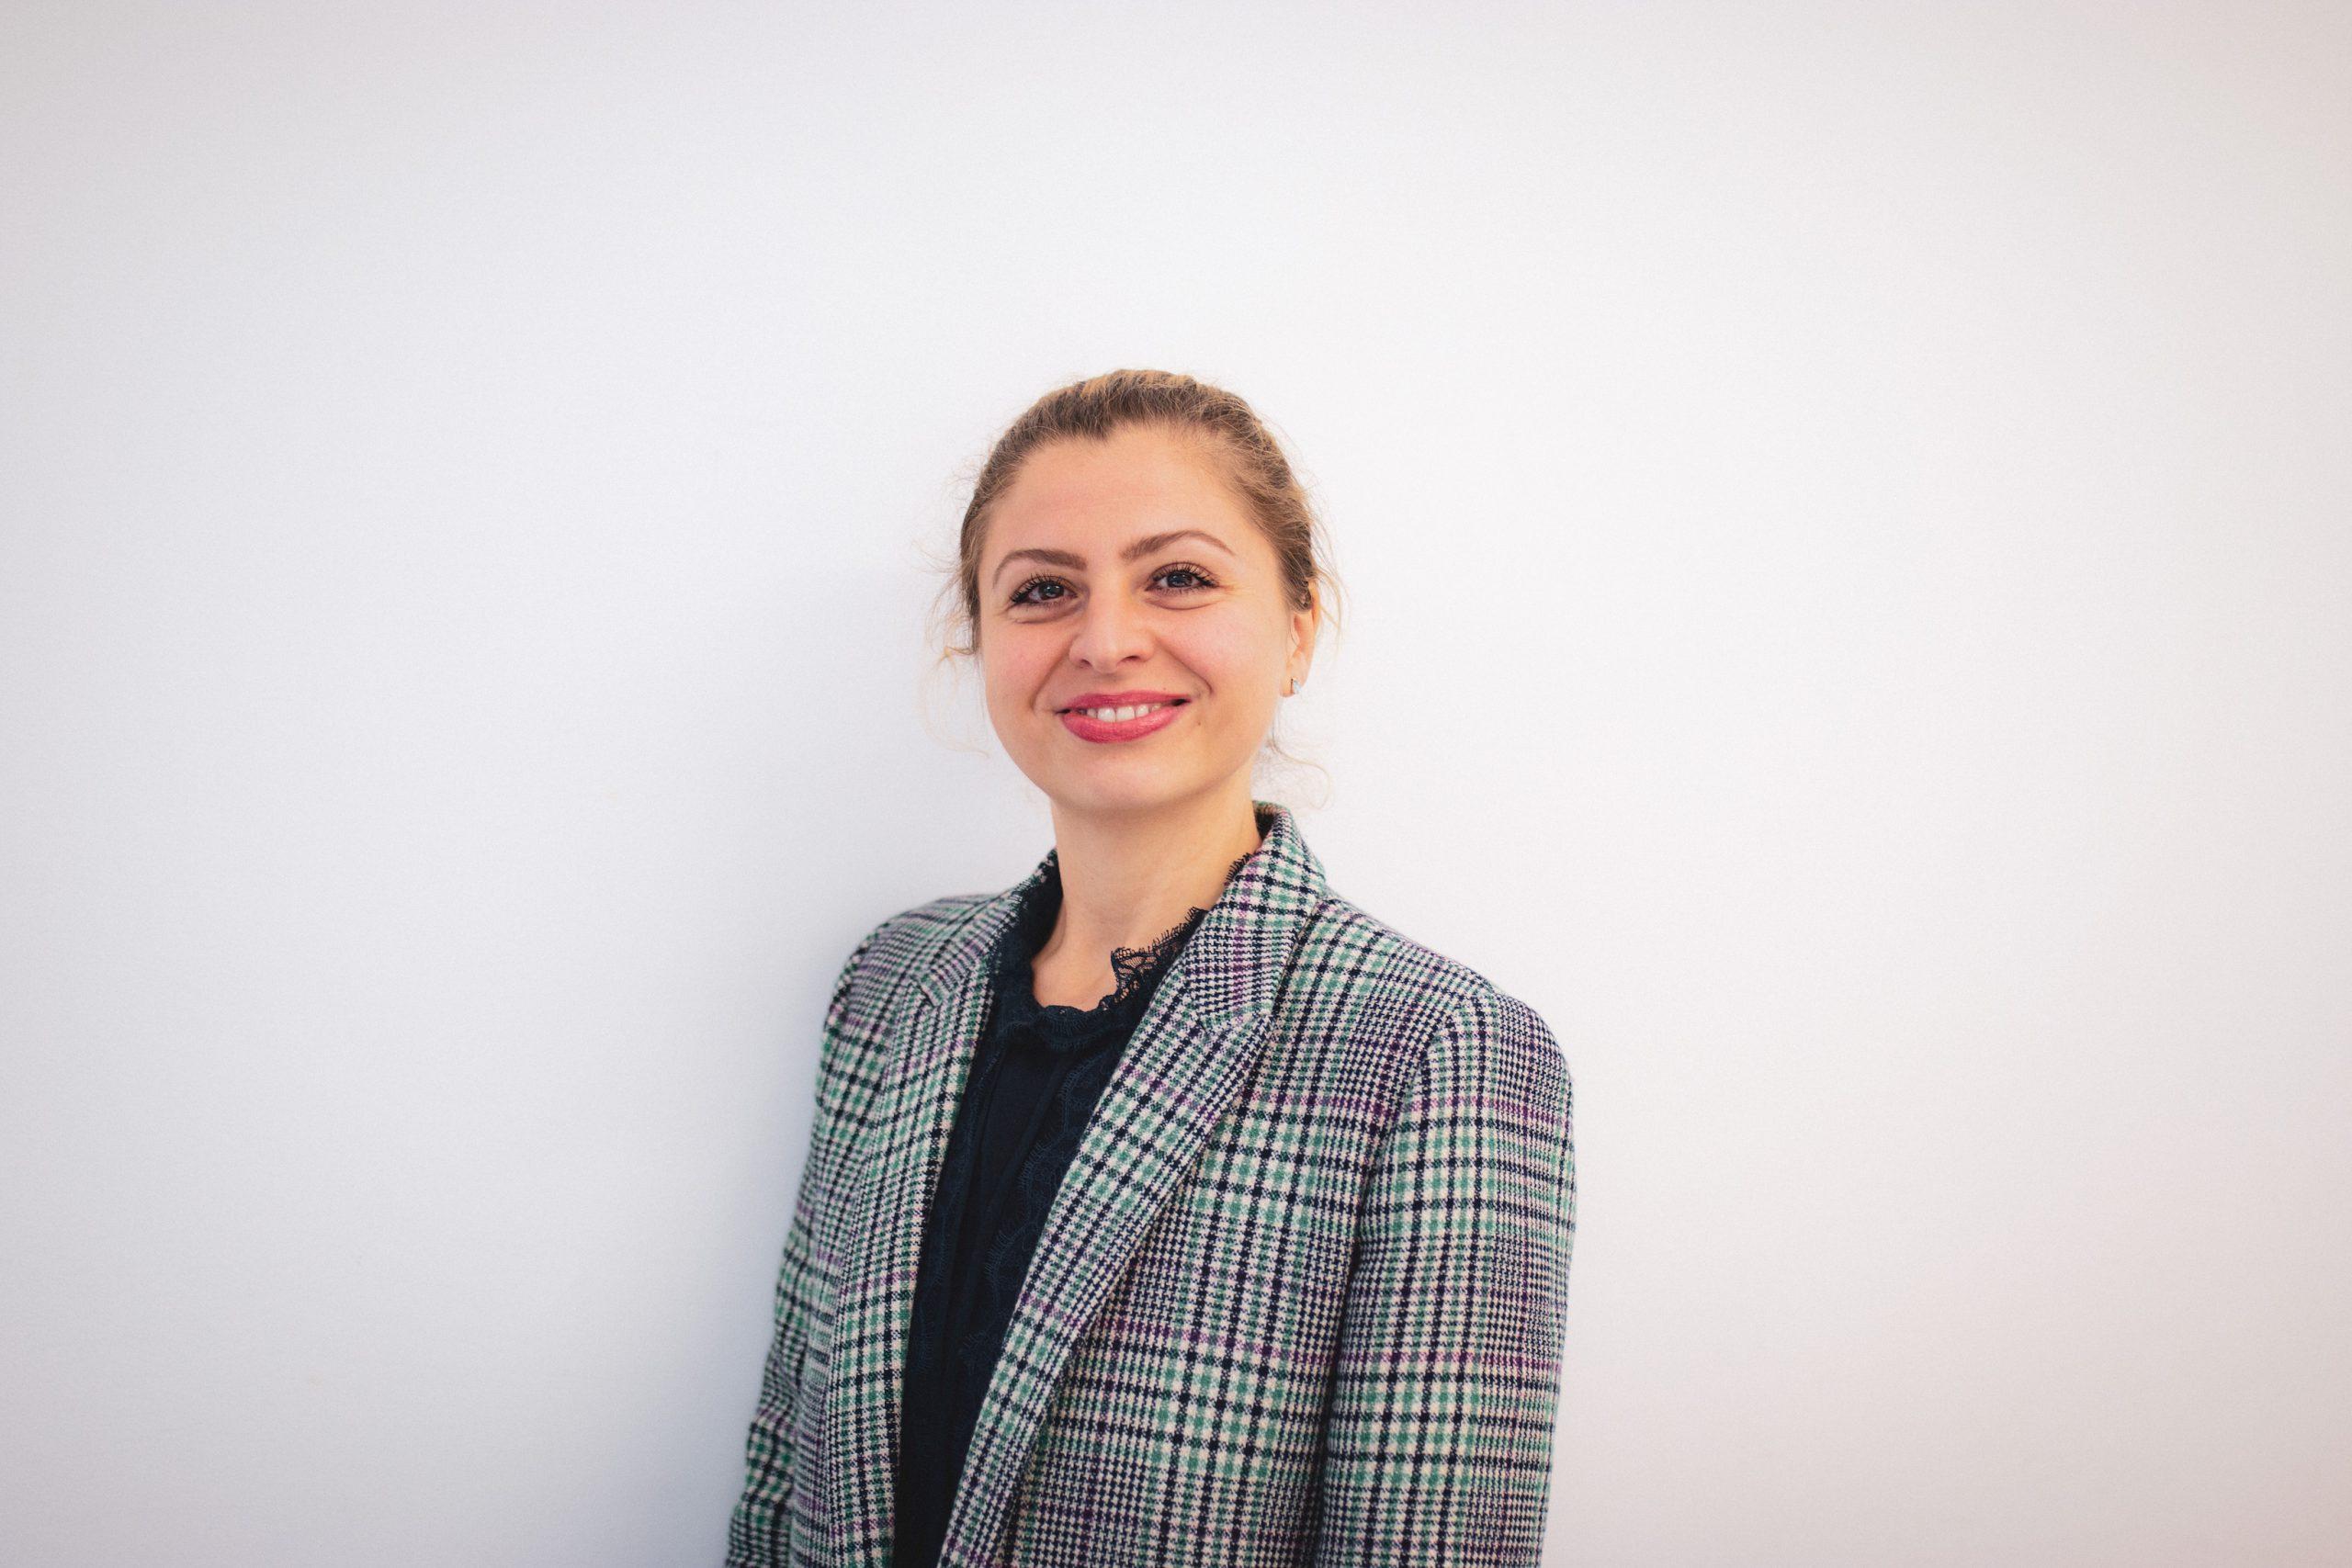 Interview mit Prof. Dr. Yonca Limon-Calisan - Brand University of Applied Sciences Hamburg